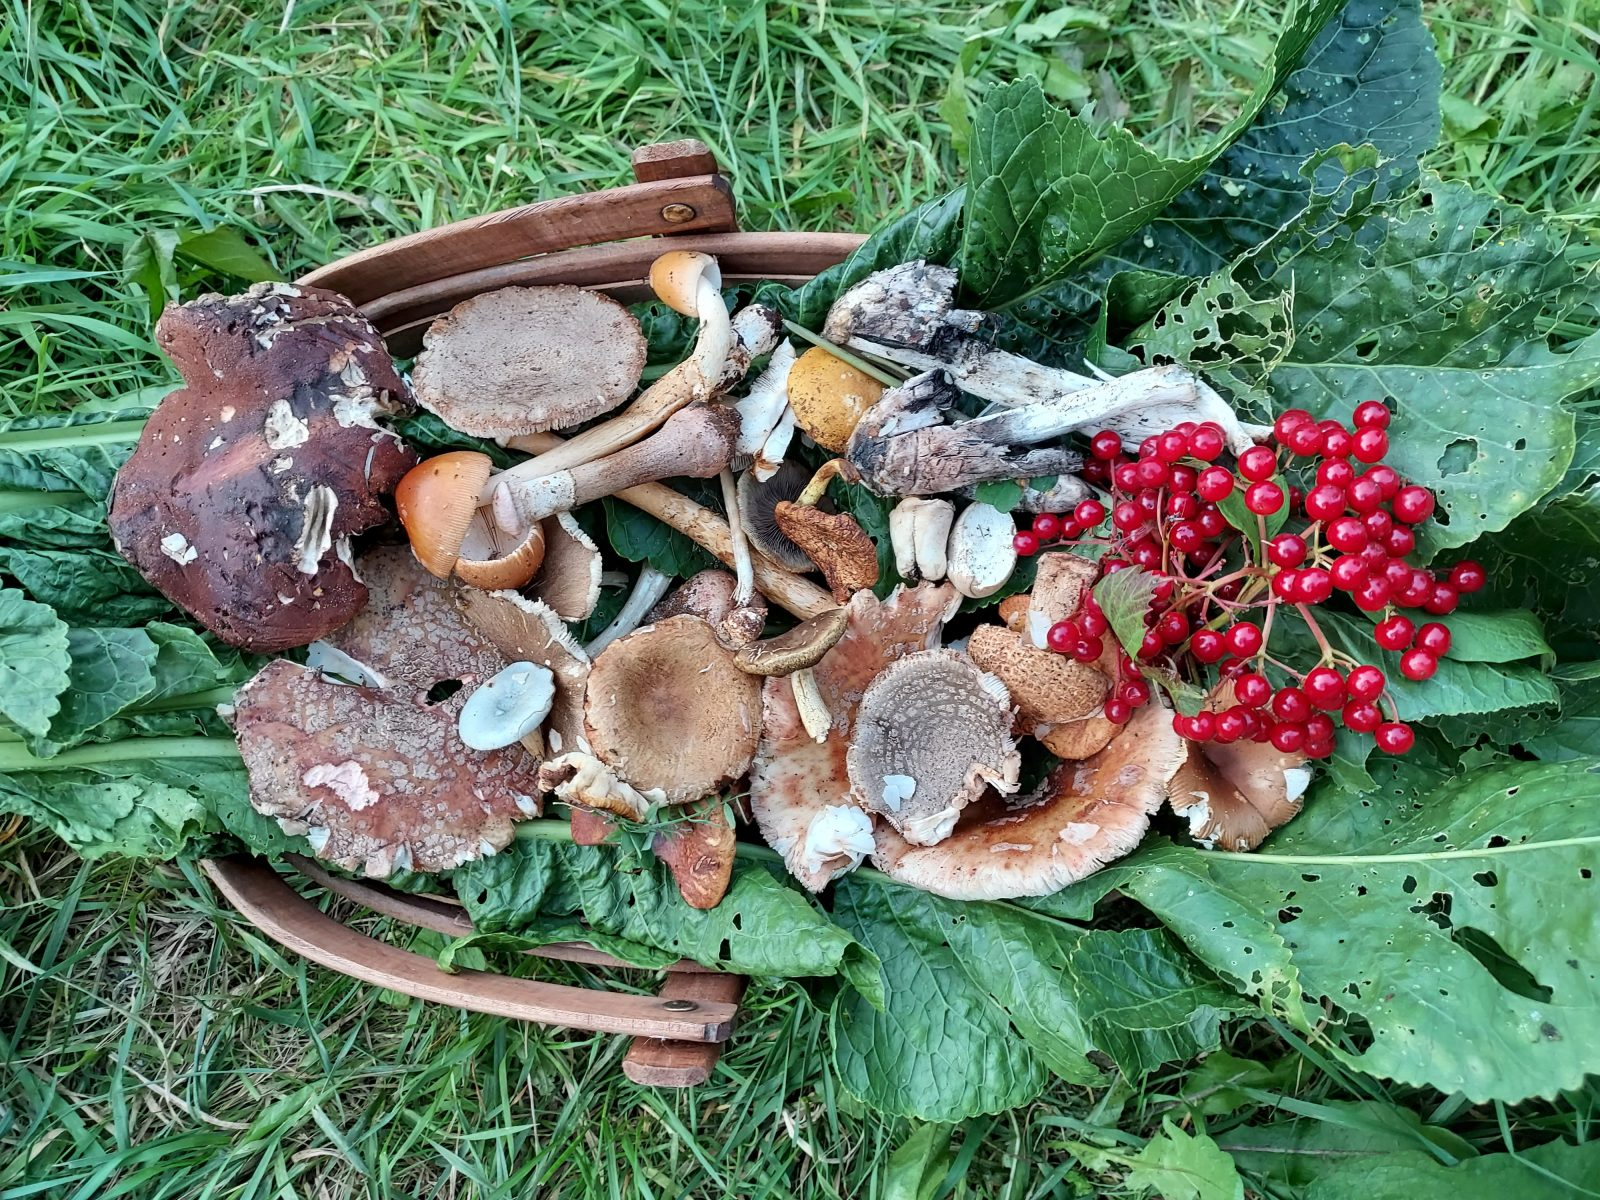 Sept21 - Foraging Finds - Taste the Wild